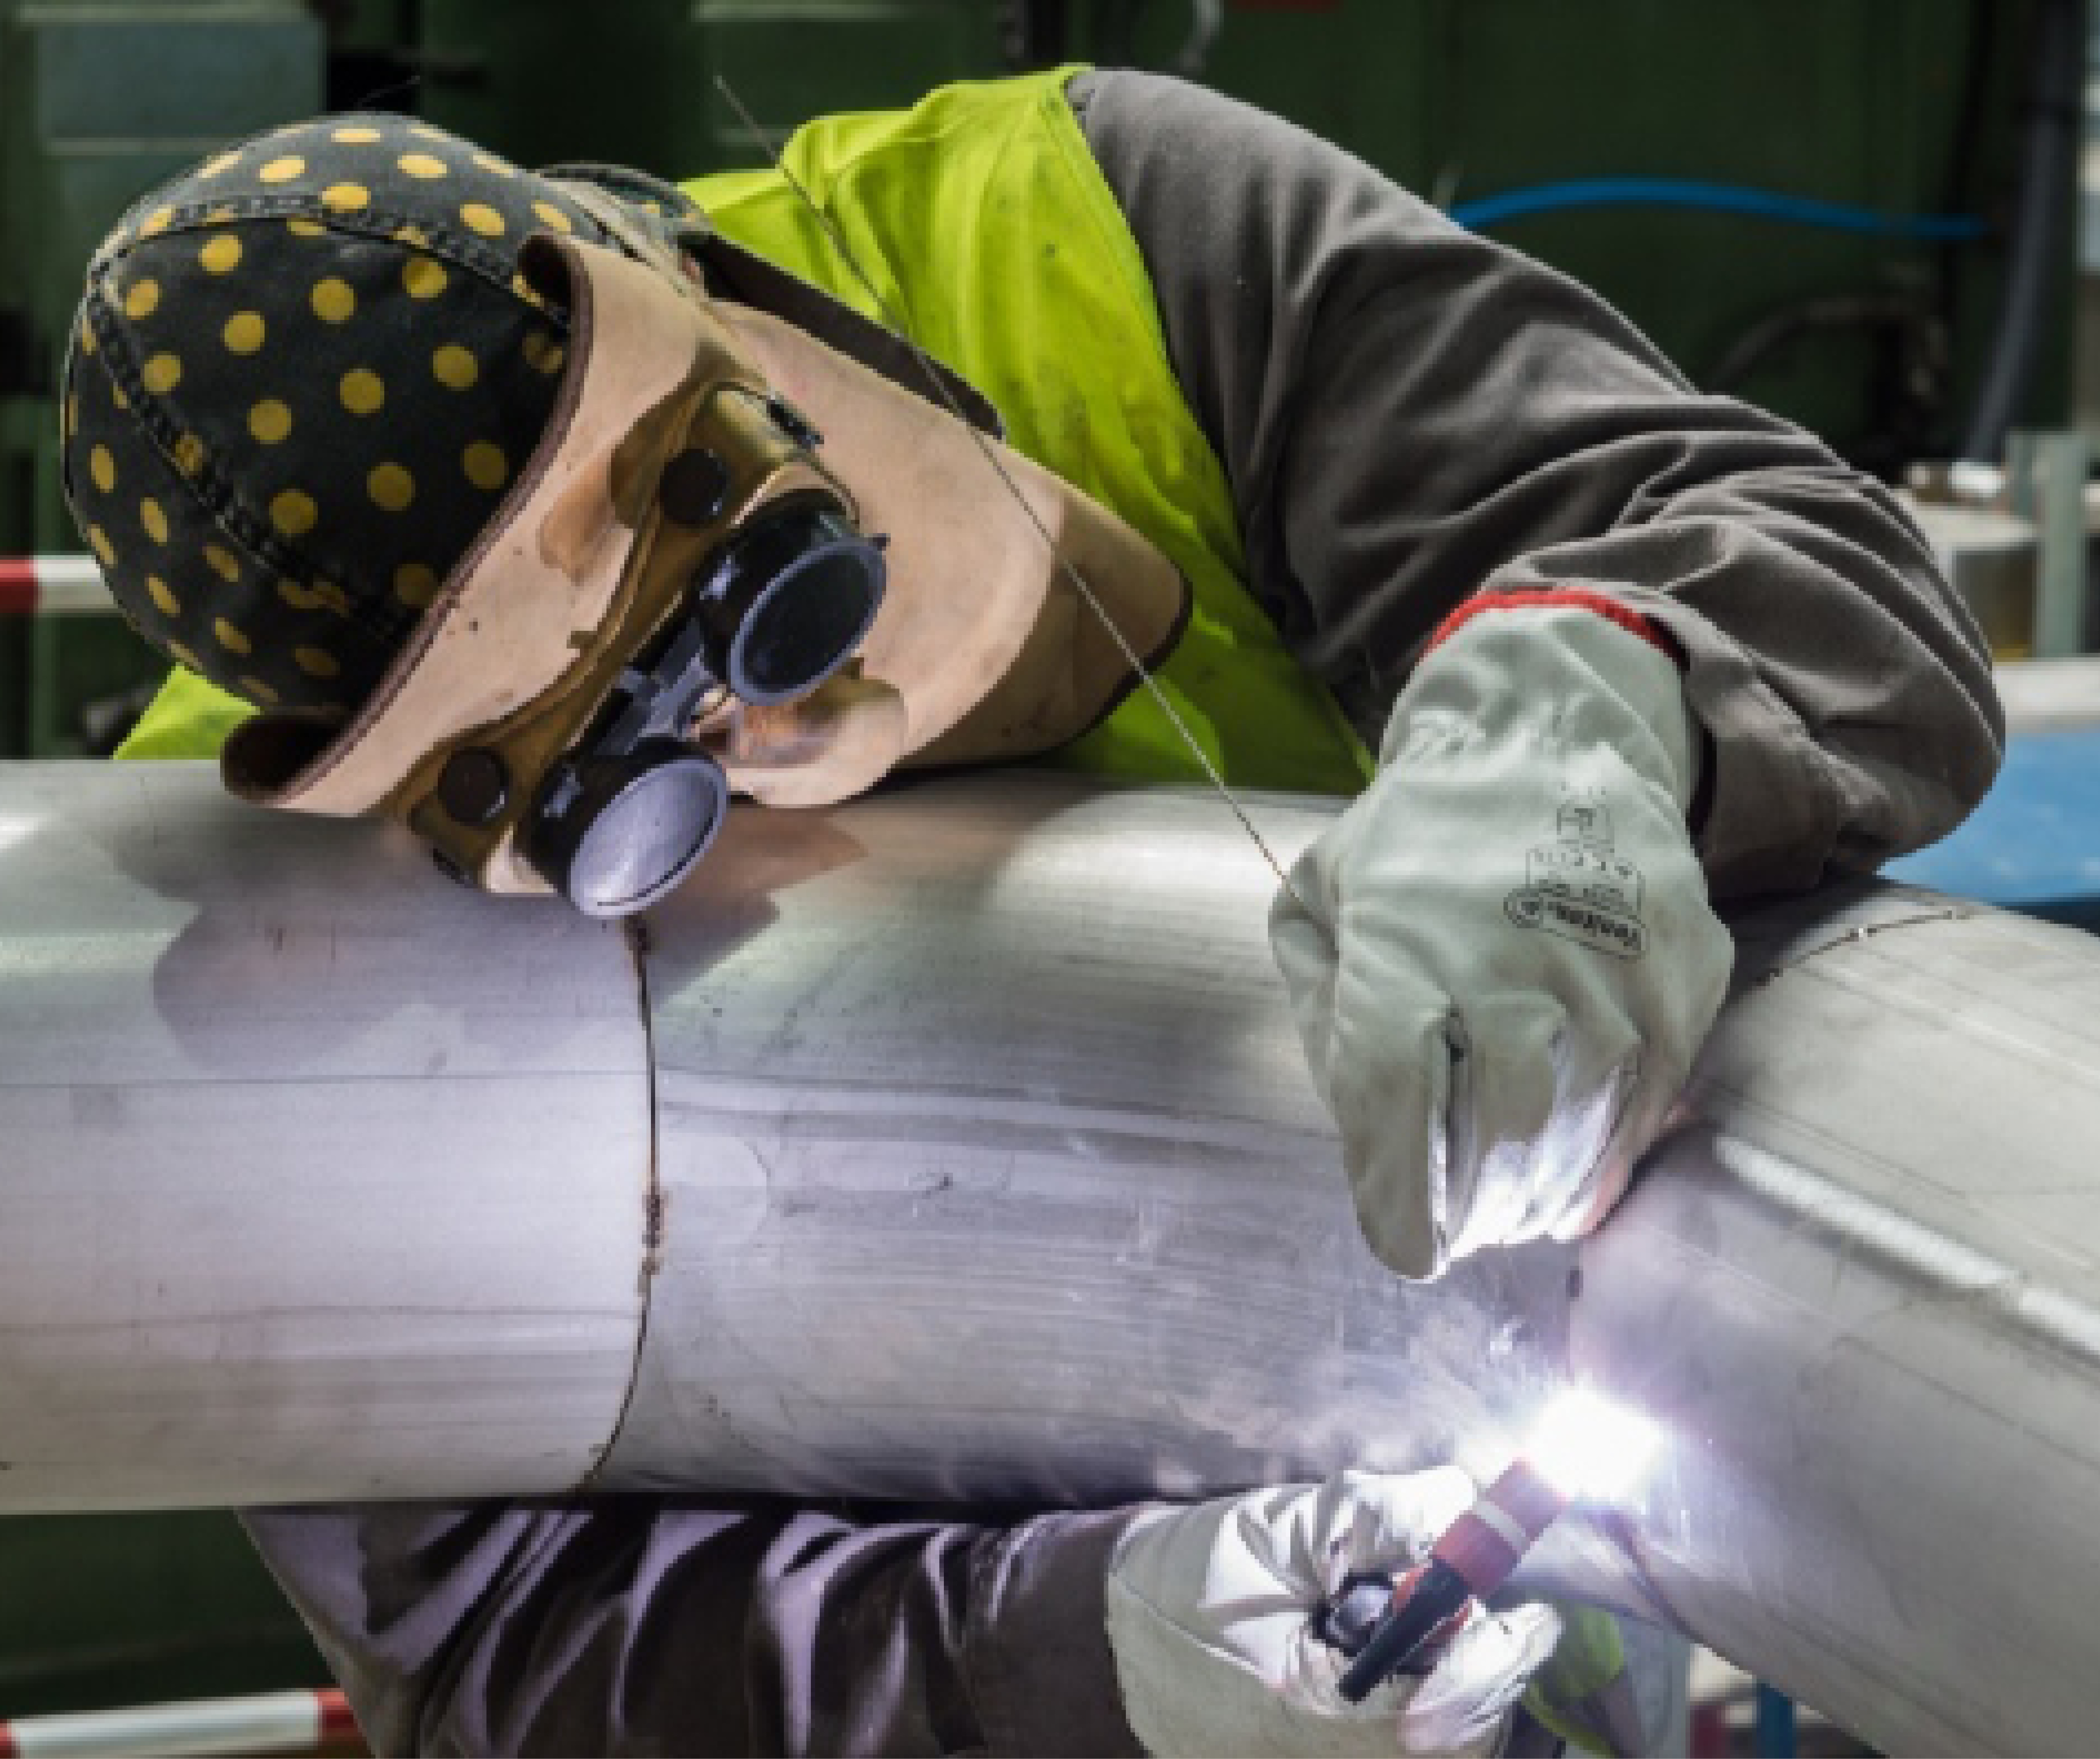 Manual TIG welding versus automated orbital TIG welding